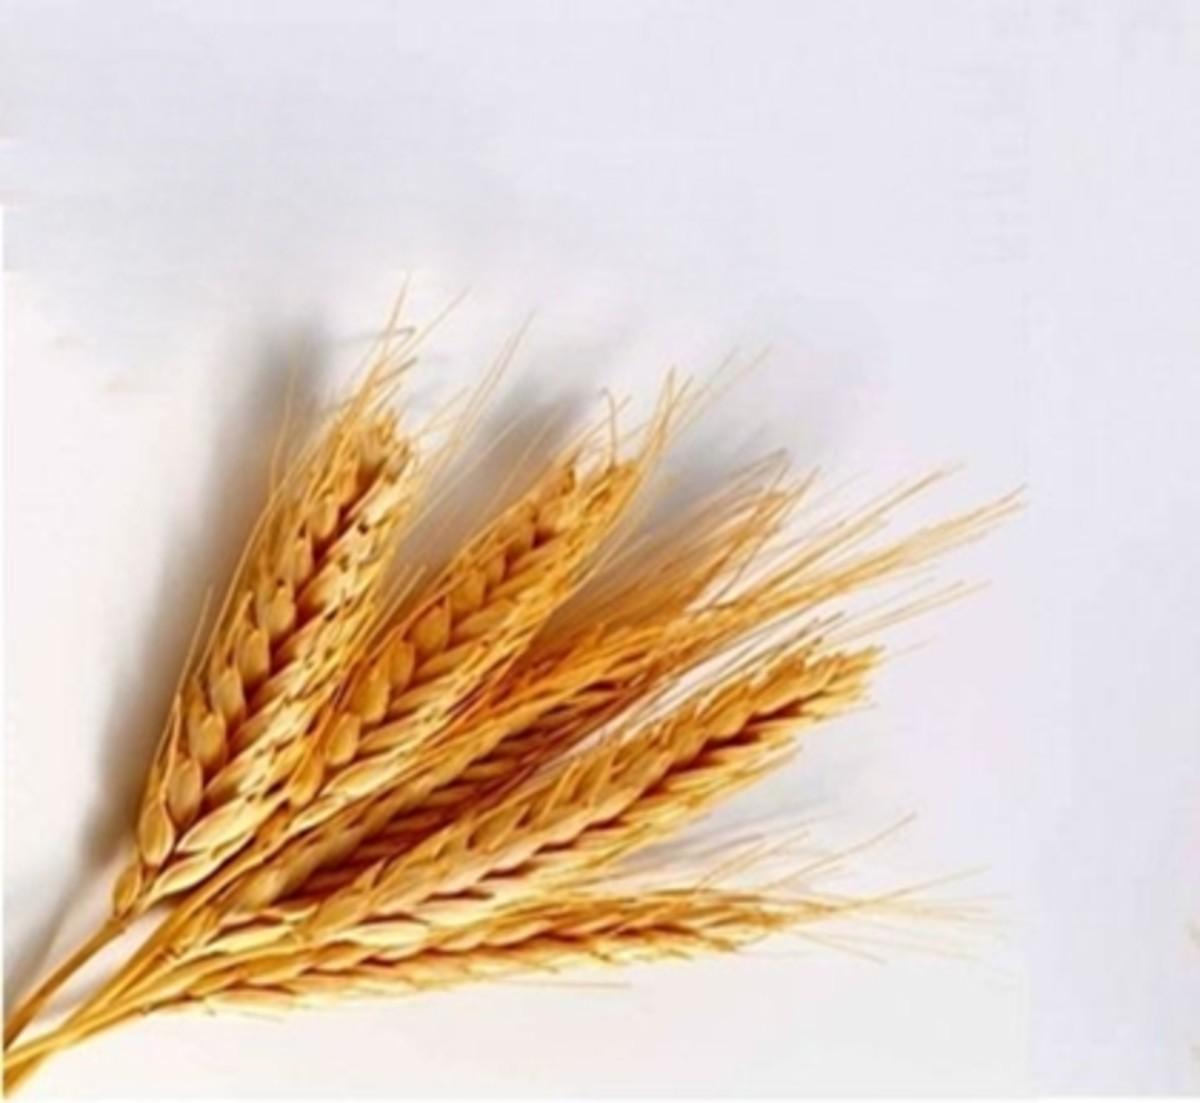 Uses of Barley and Recipes